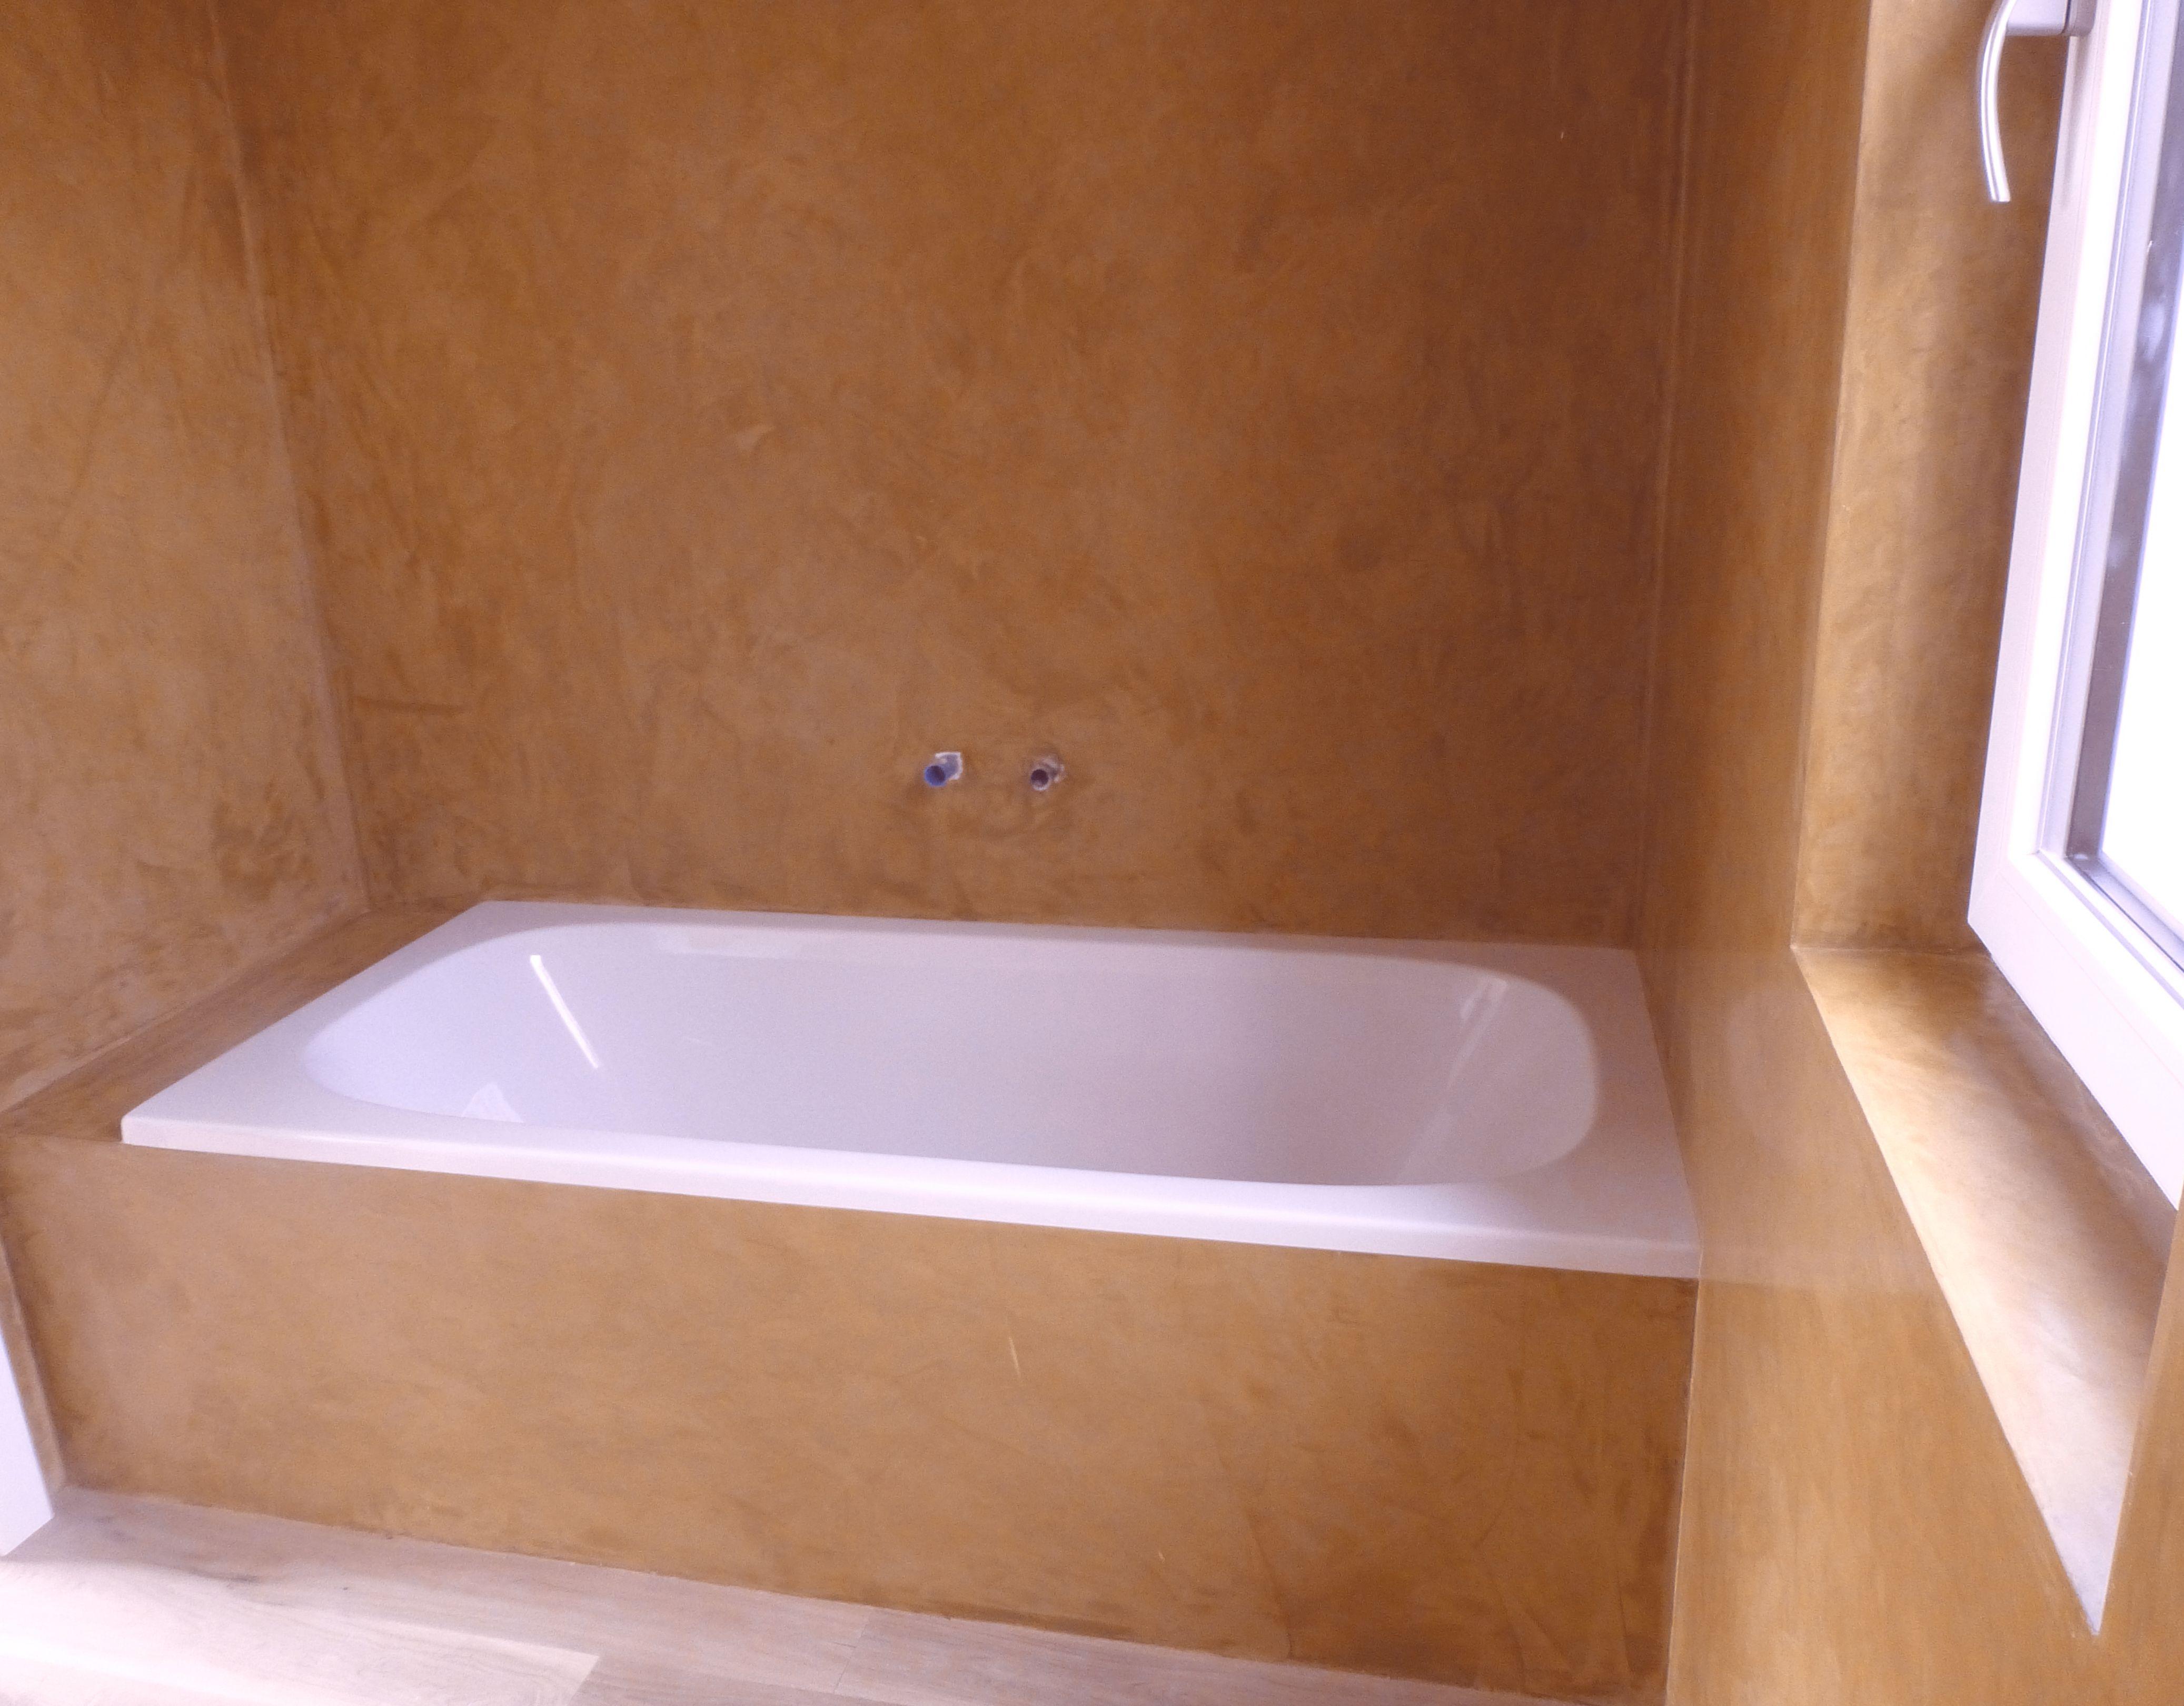 Stucco Veneziano Im Badezimmer Badezimmer Baden Baumaterialien